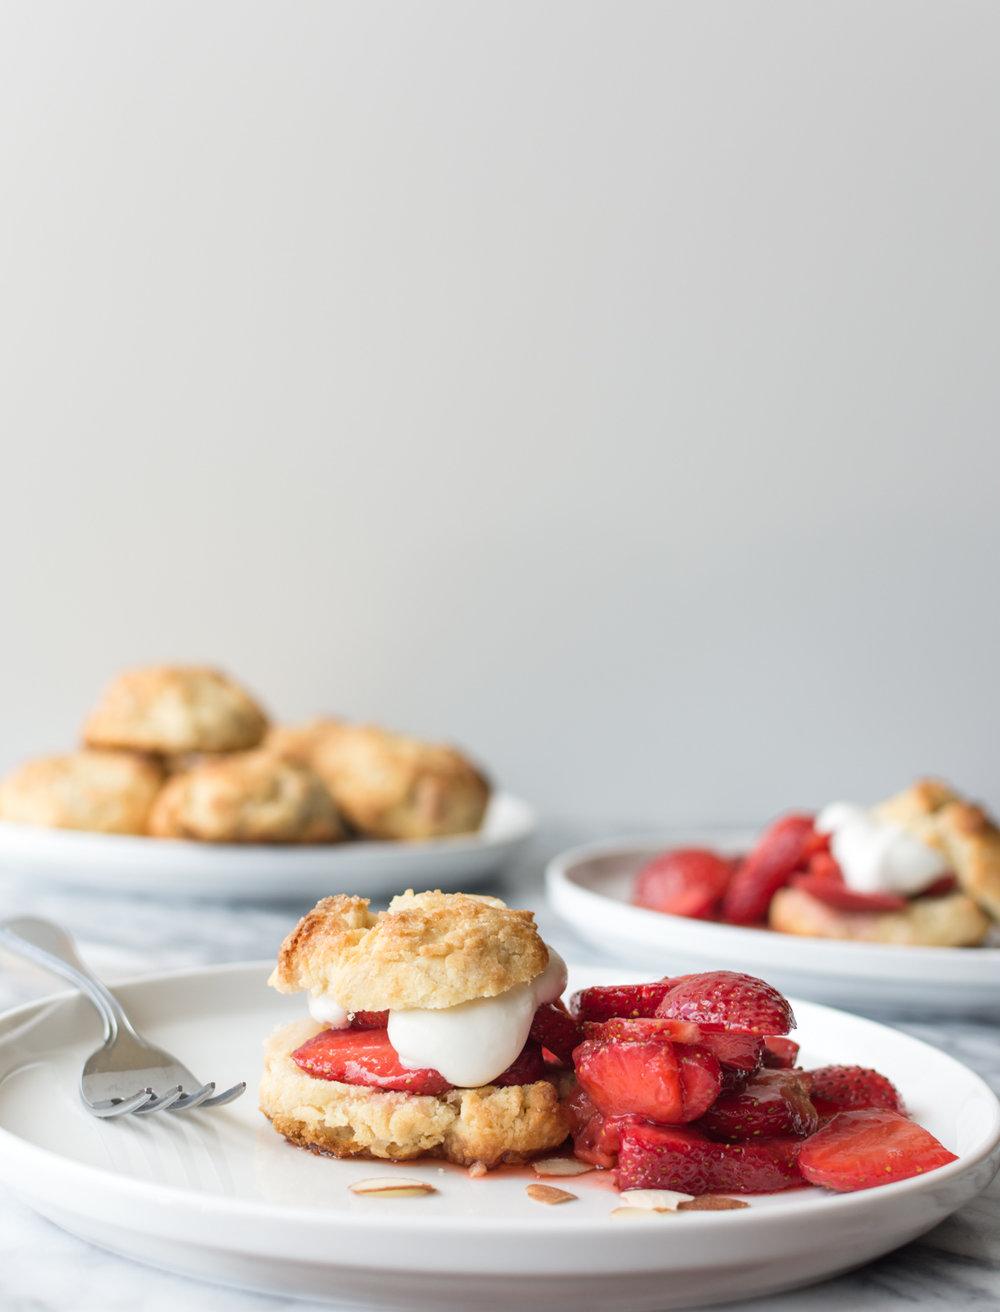 strawberry almond scone cakes.jpg